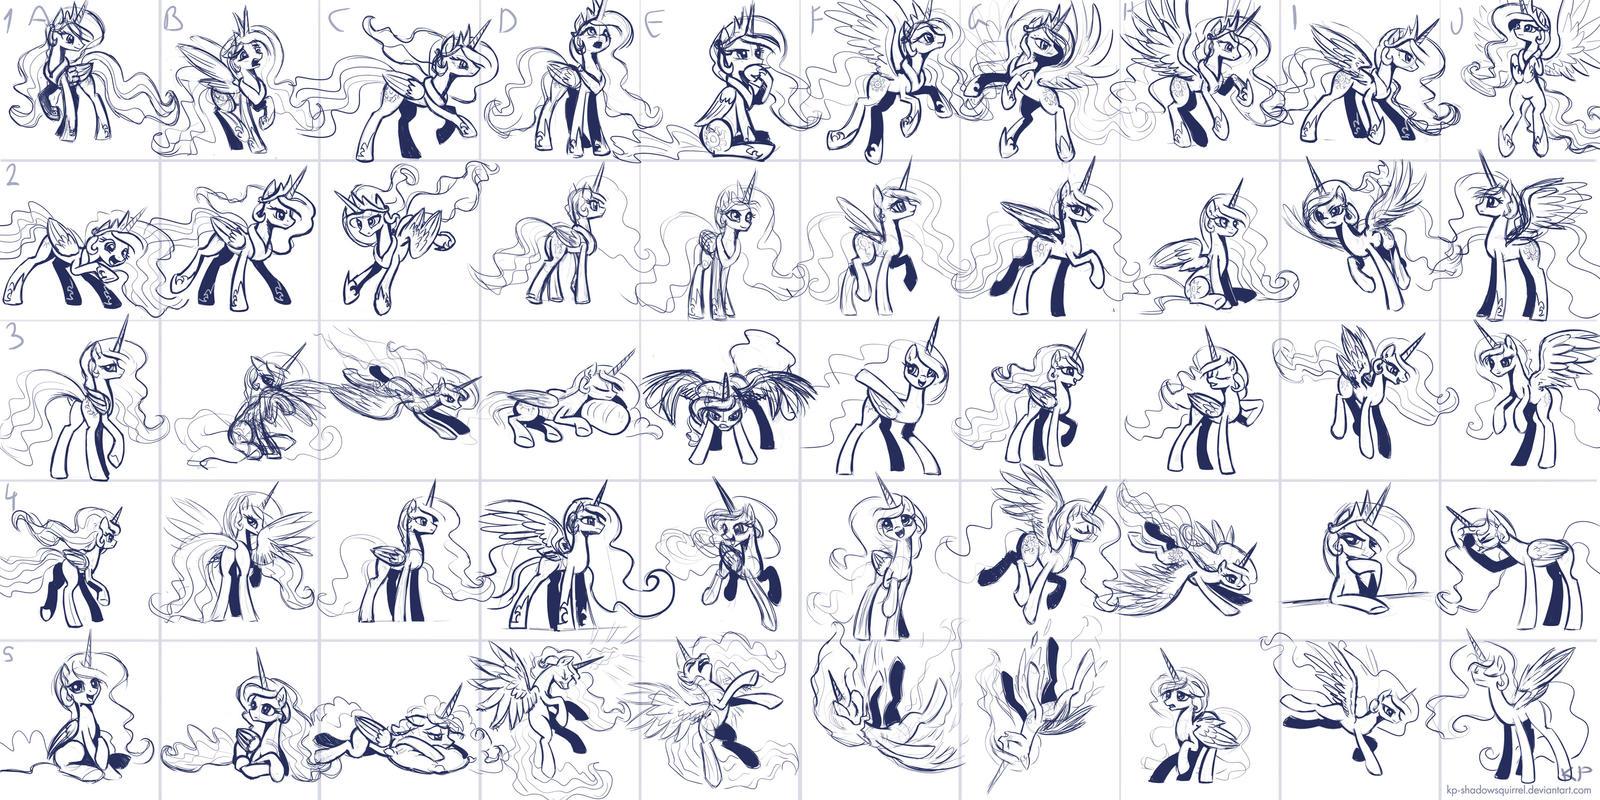 Super Speedy Celestia Sketches by KP-ShadowSquirrel